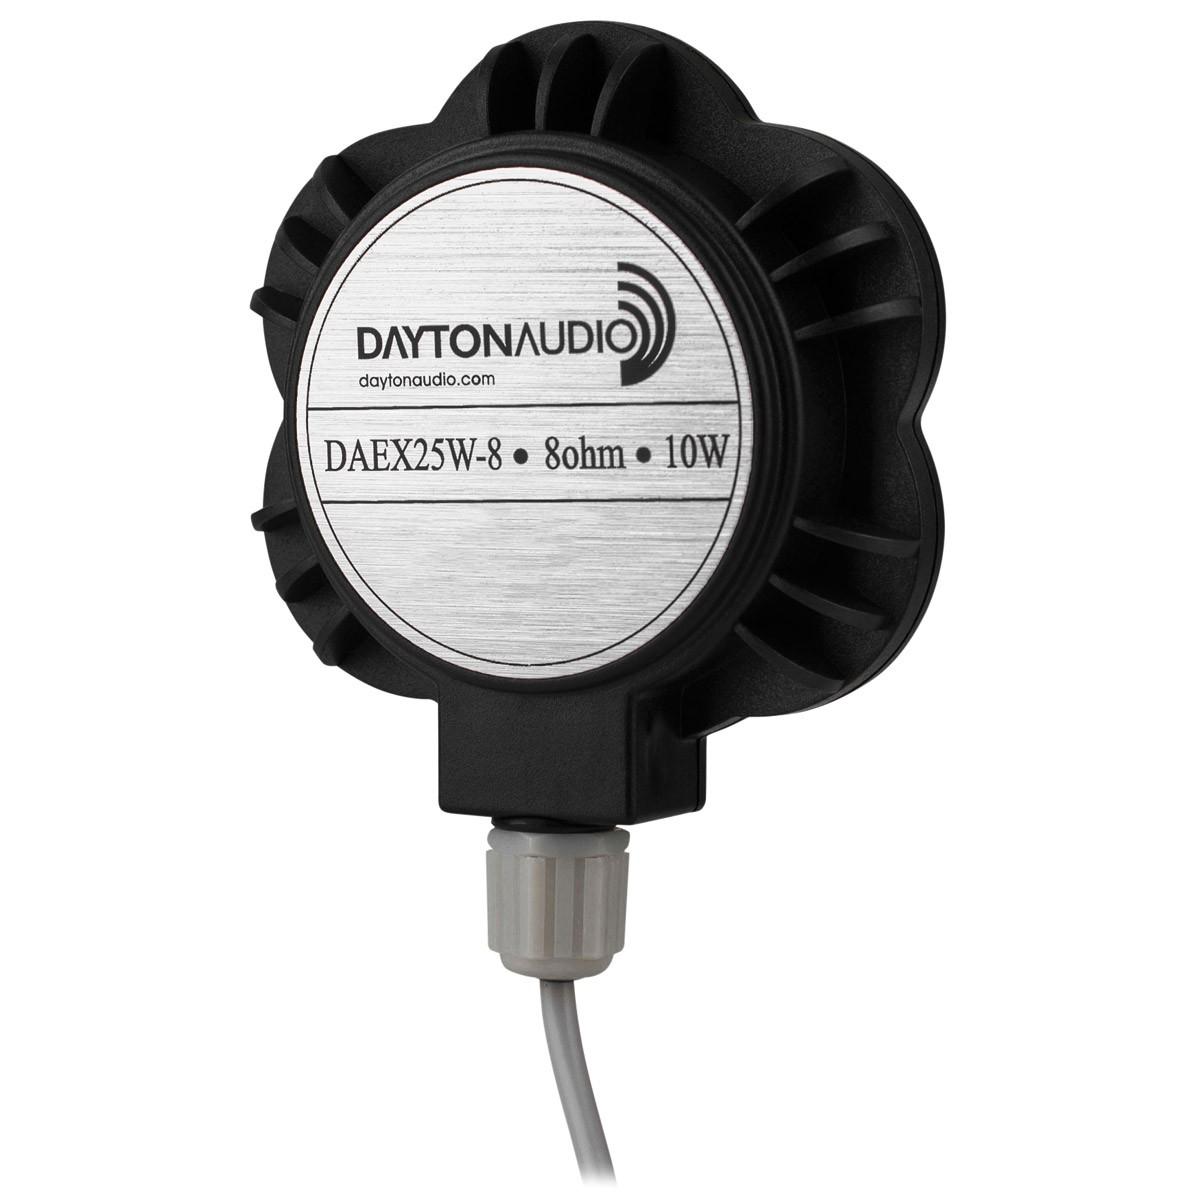 DAYTON AUDIO DAEX25W-8 Waterproof Speaker Driver Exciter Bodyshaker Full Range 10W 8 Ohm Ø25mm